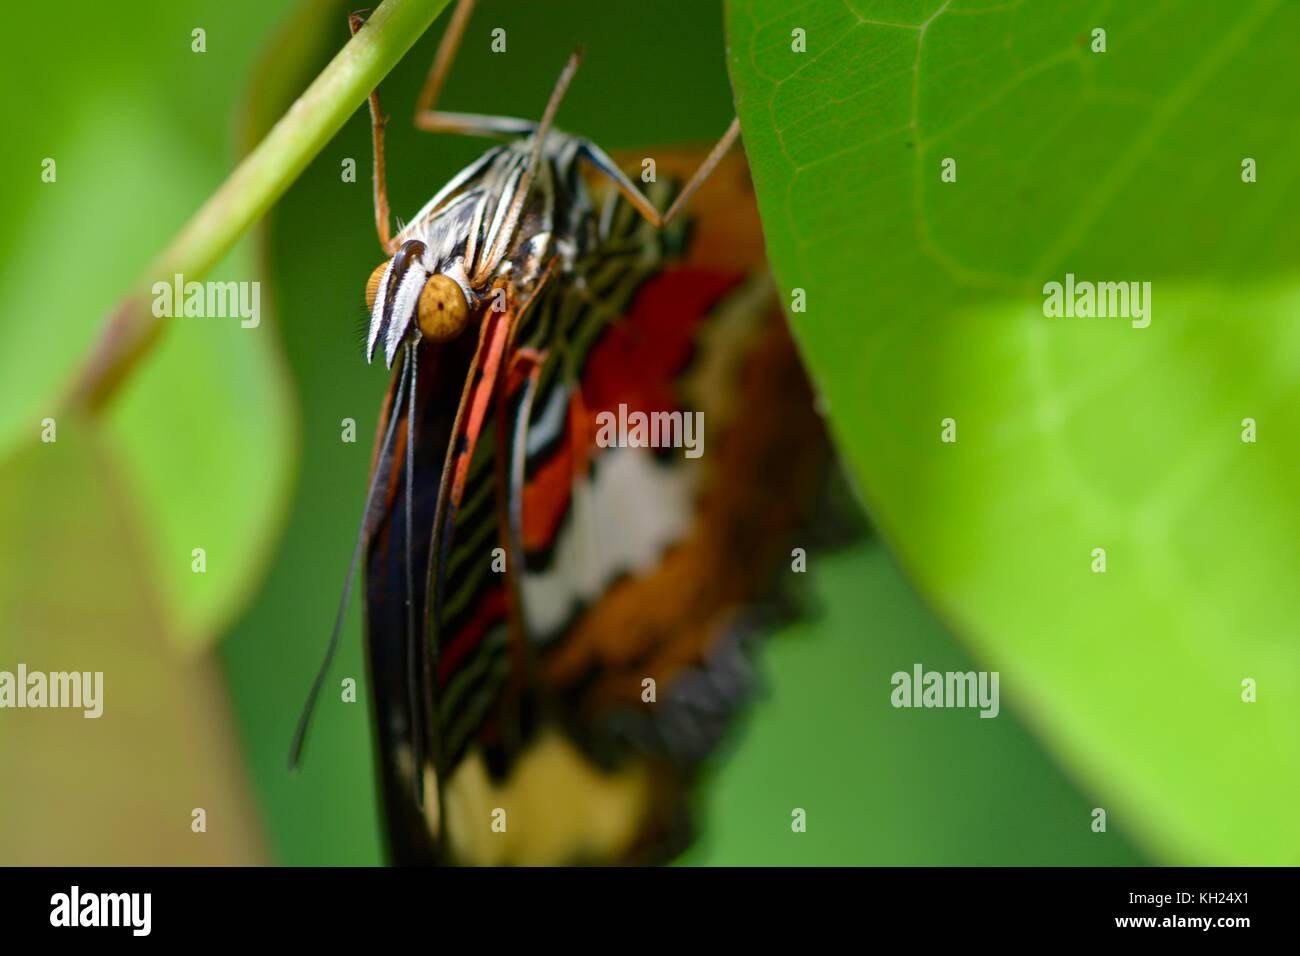 Appena emerse lacewing rosso butterfly dal Borneo Immagini Stock